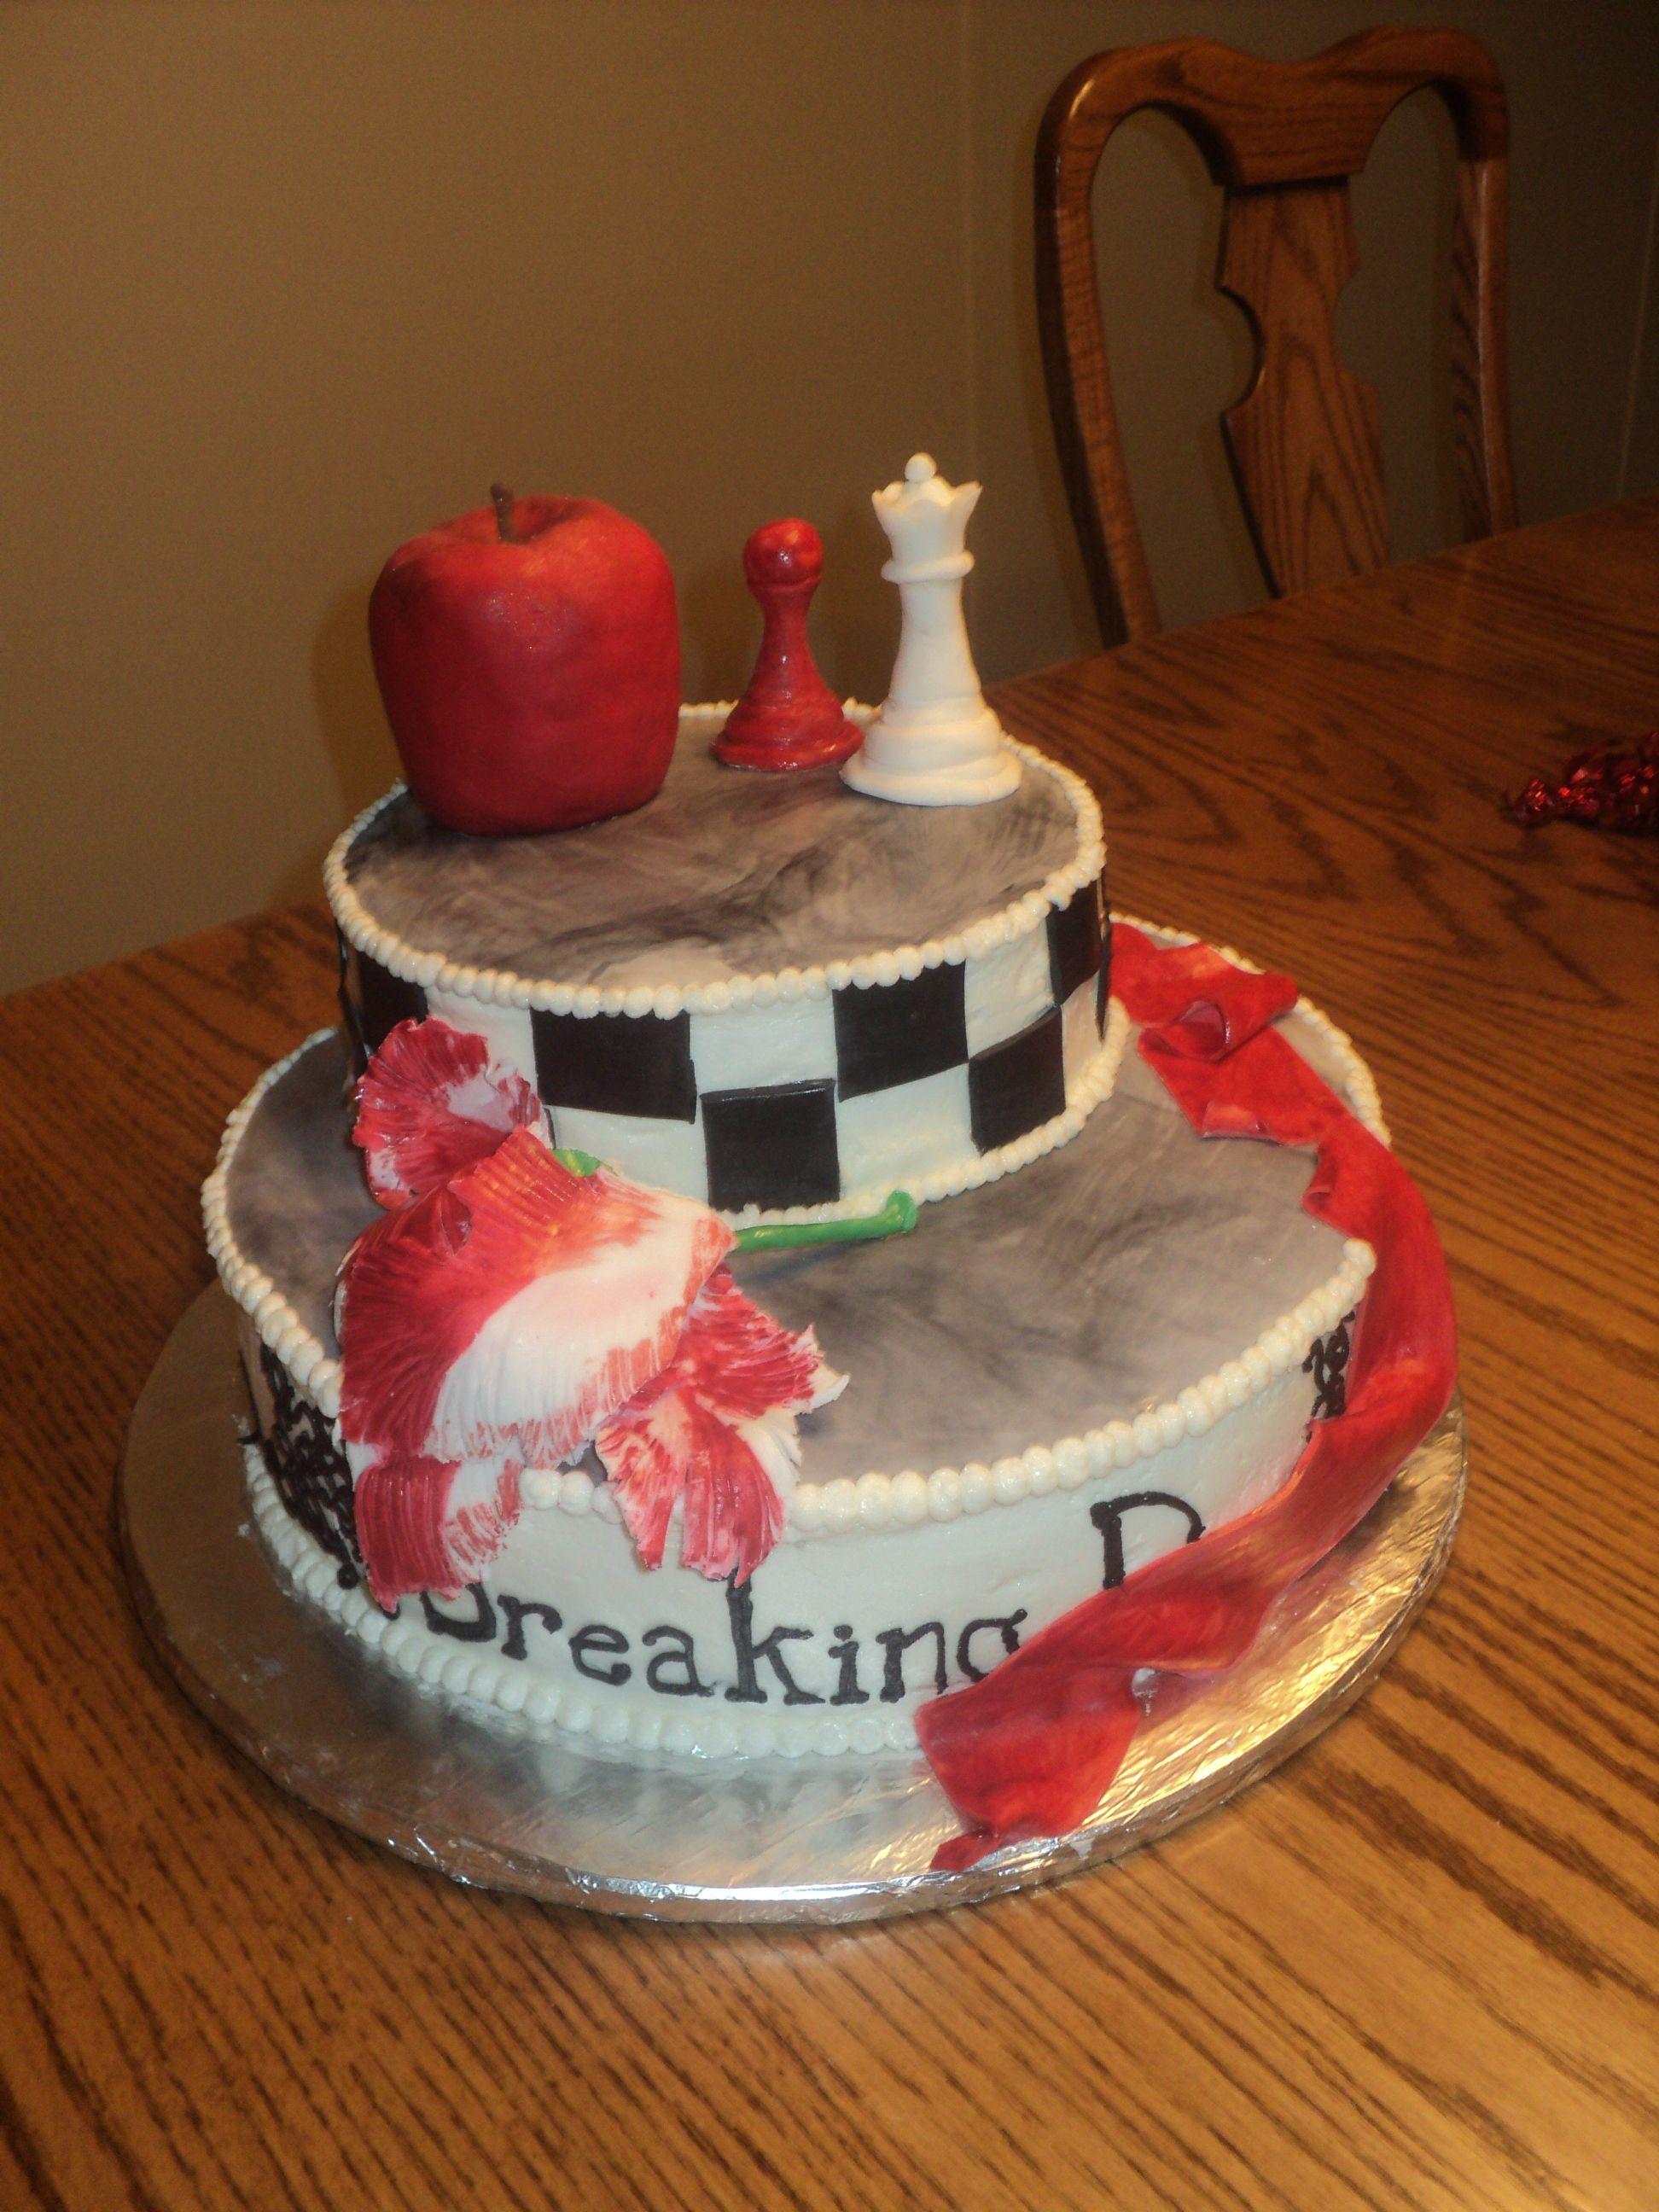 Twilight Saga Cake With Edible Apple And Decorations